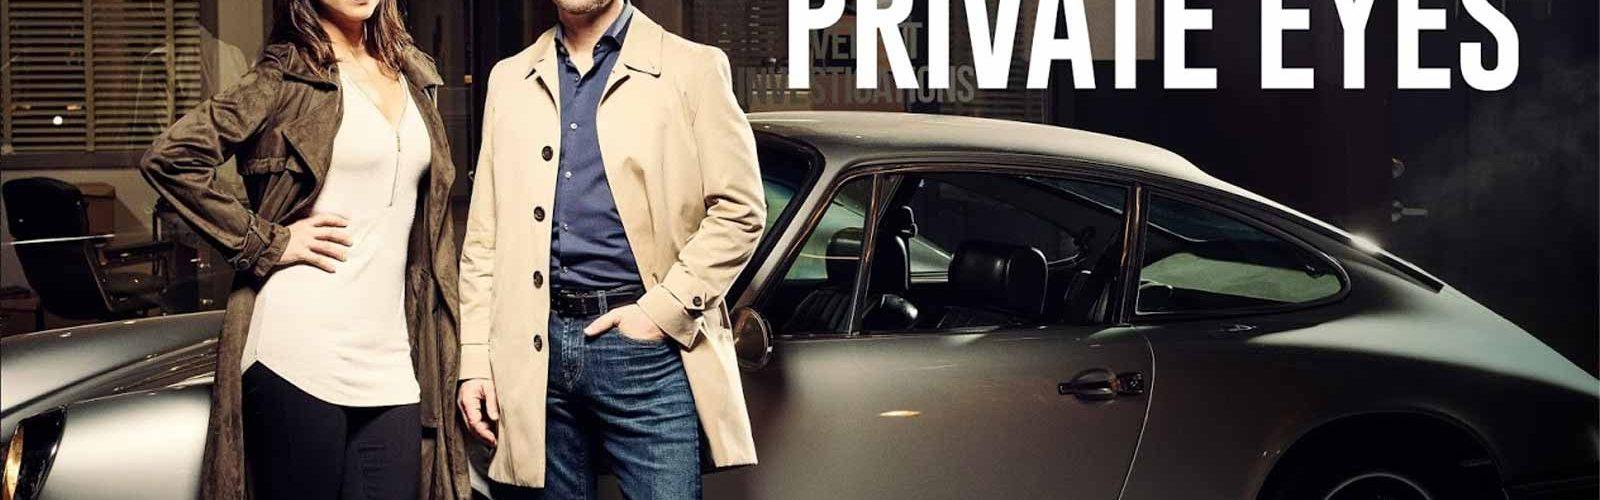 Private eyes Season 6